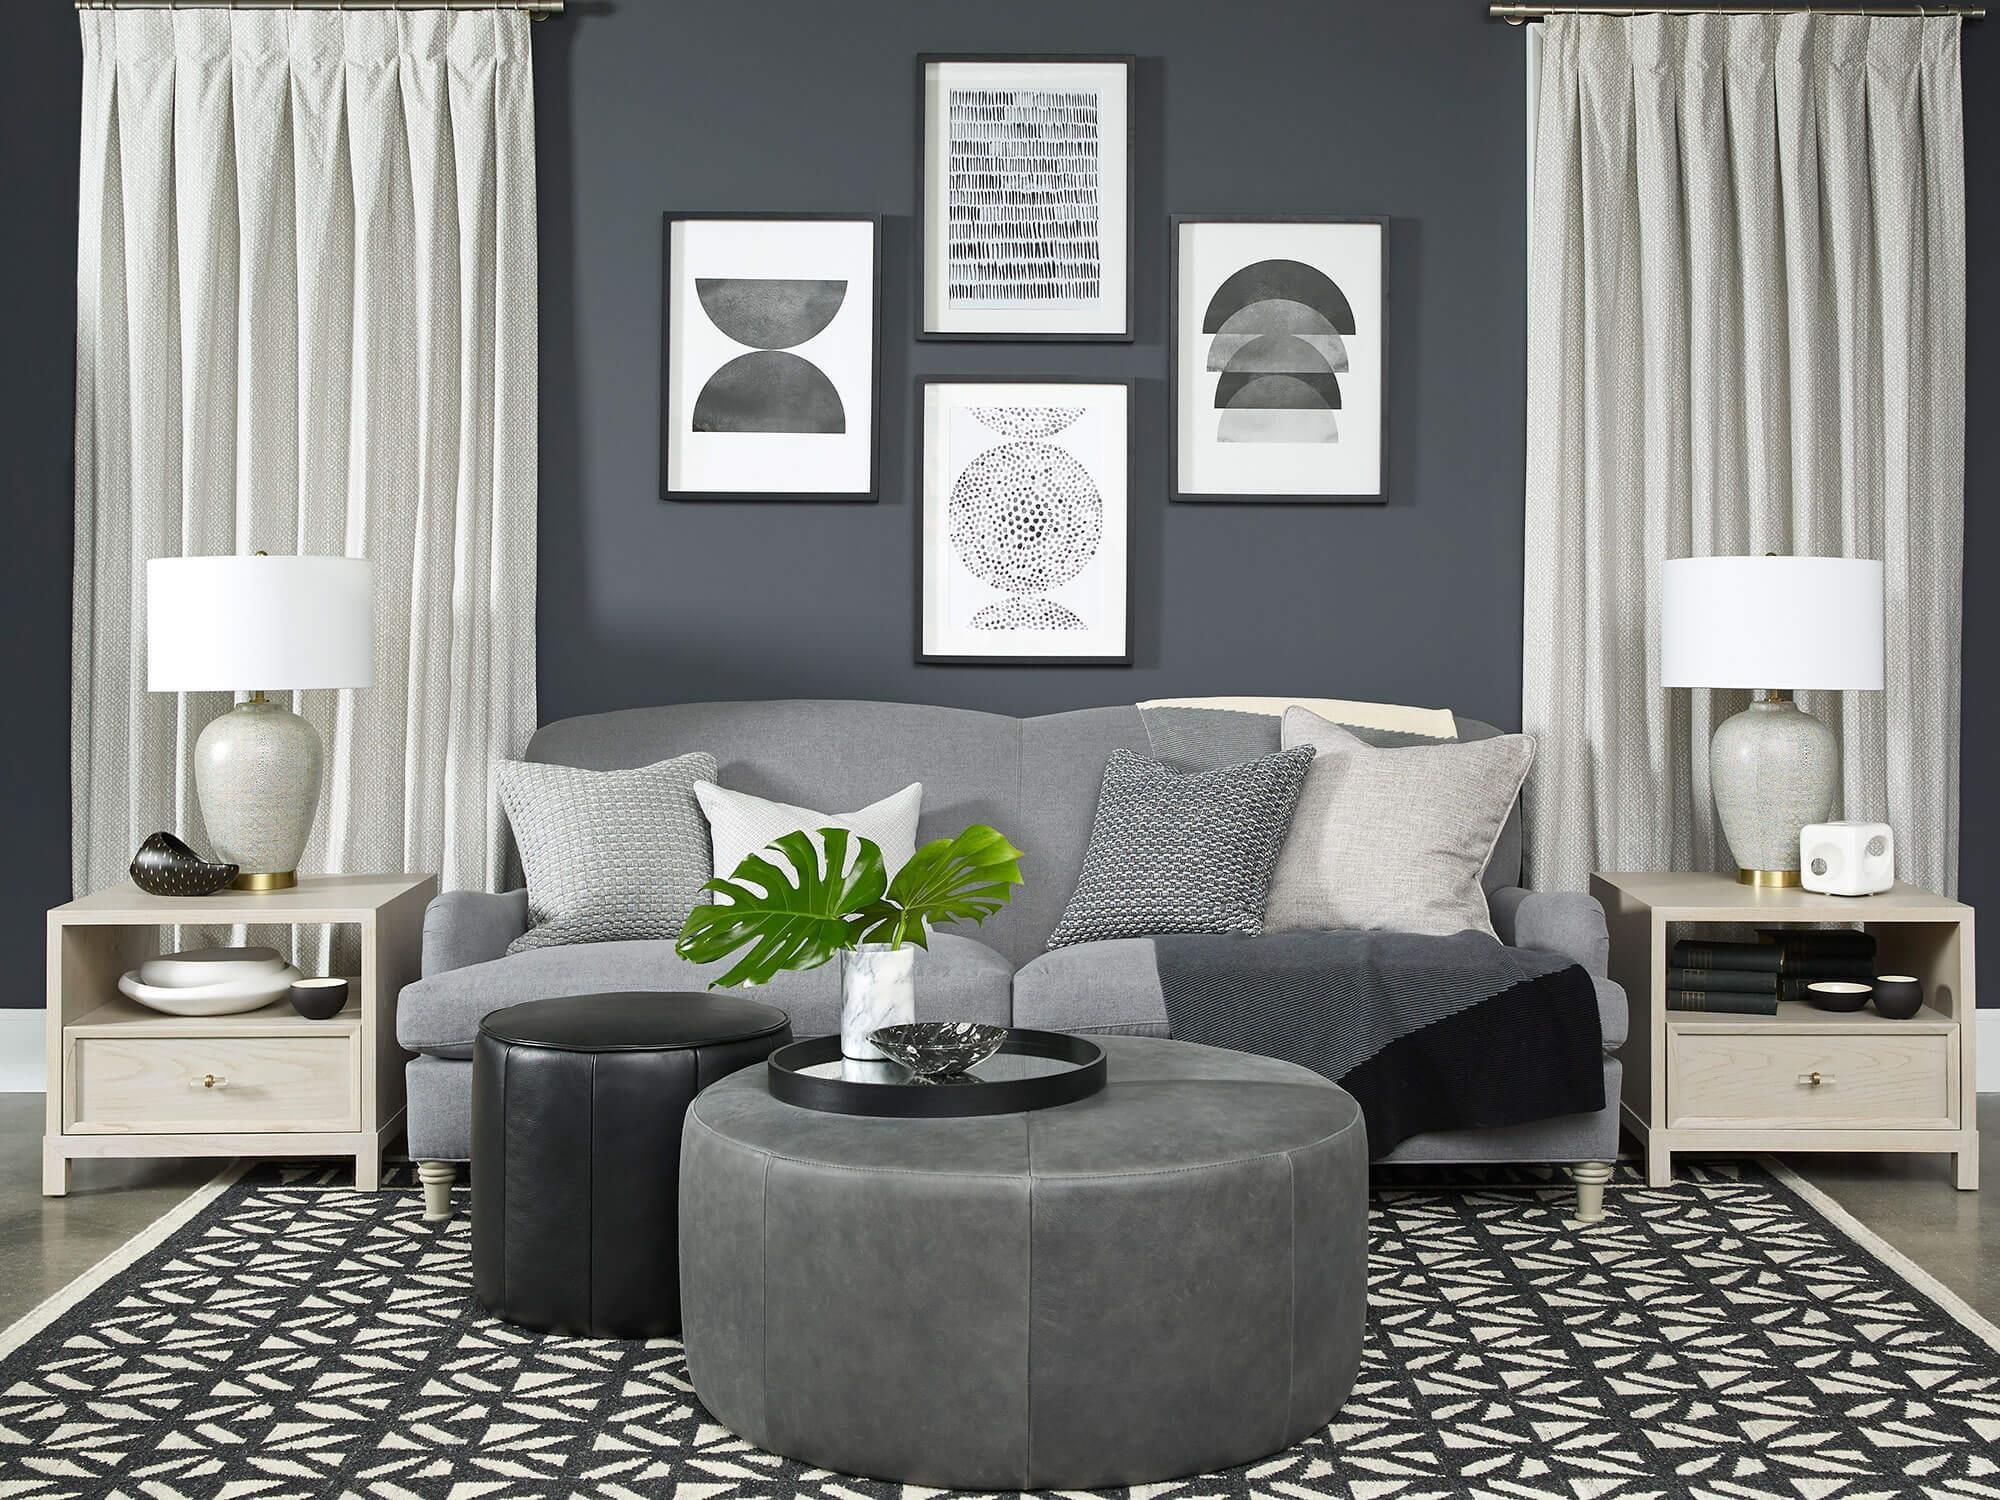 Vantage Sofa-jumper Ink/gr3